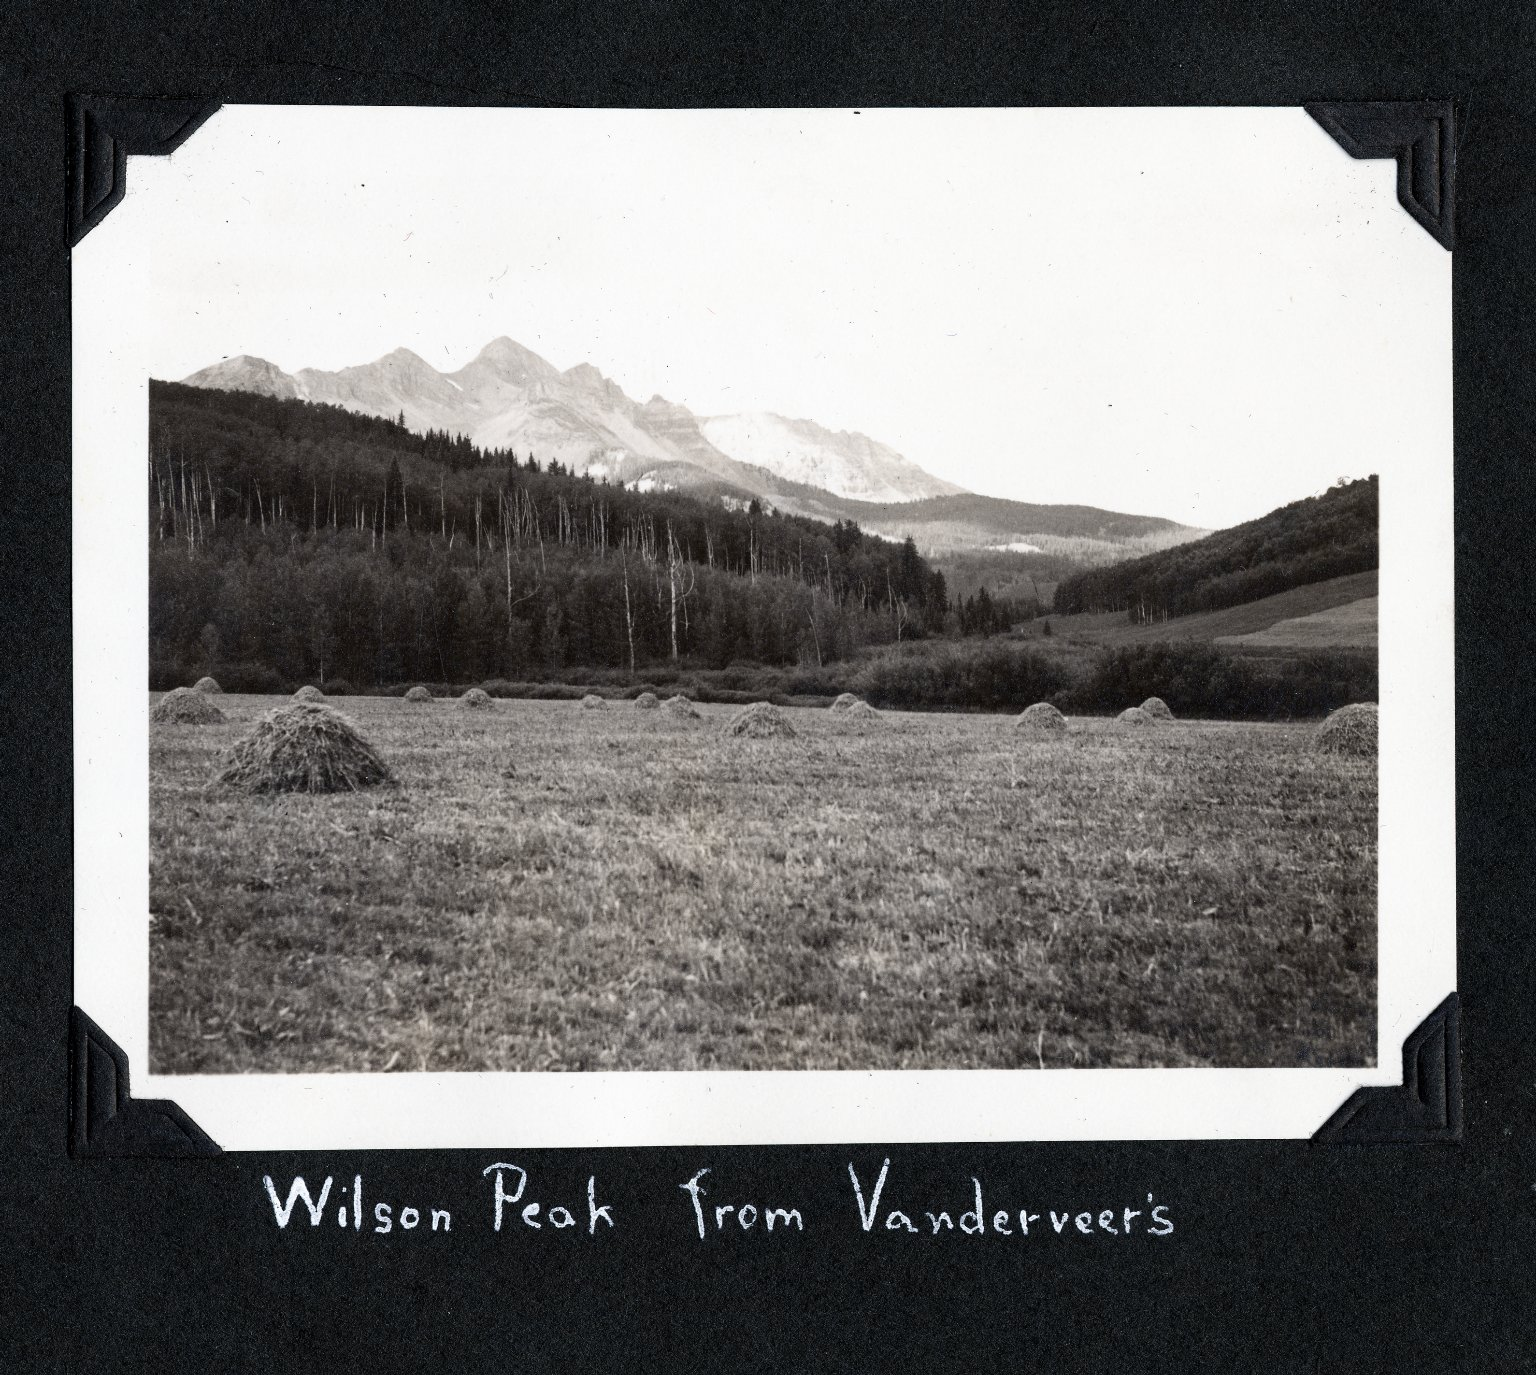 Wilson Peak from Venderveer's